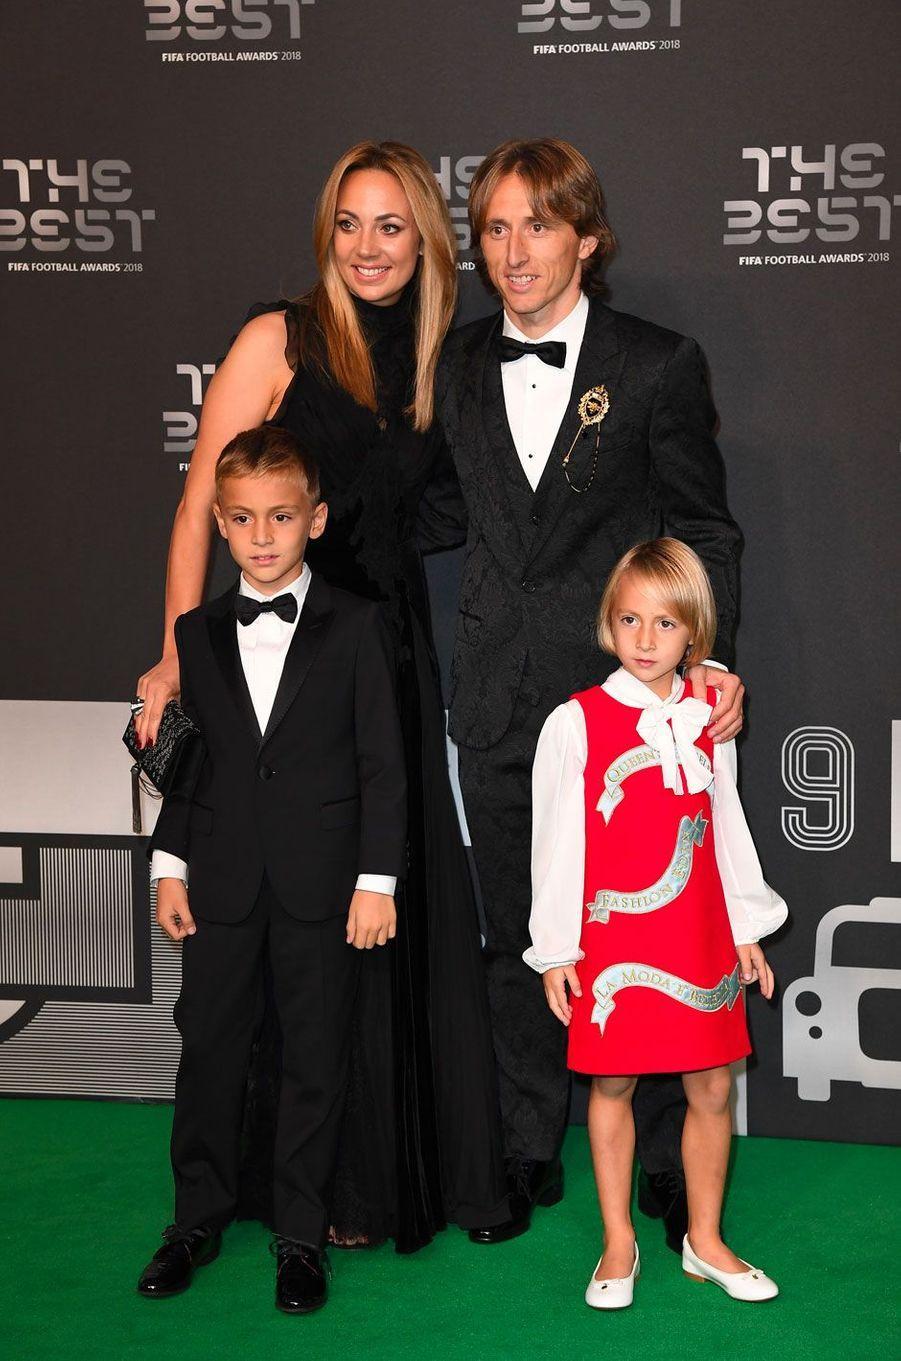 Luka Modric avec sa femme Vanja et leurs deux enfants Ivano et Ema